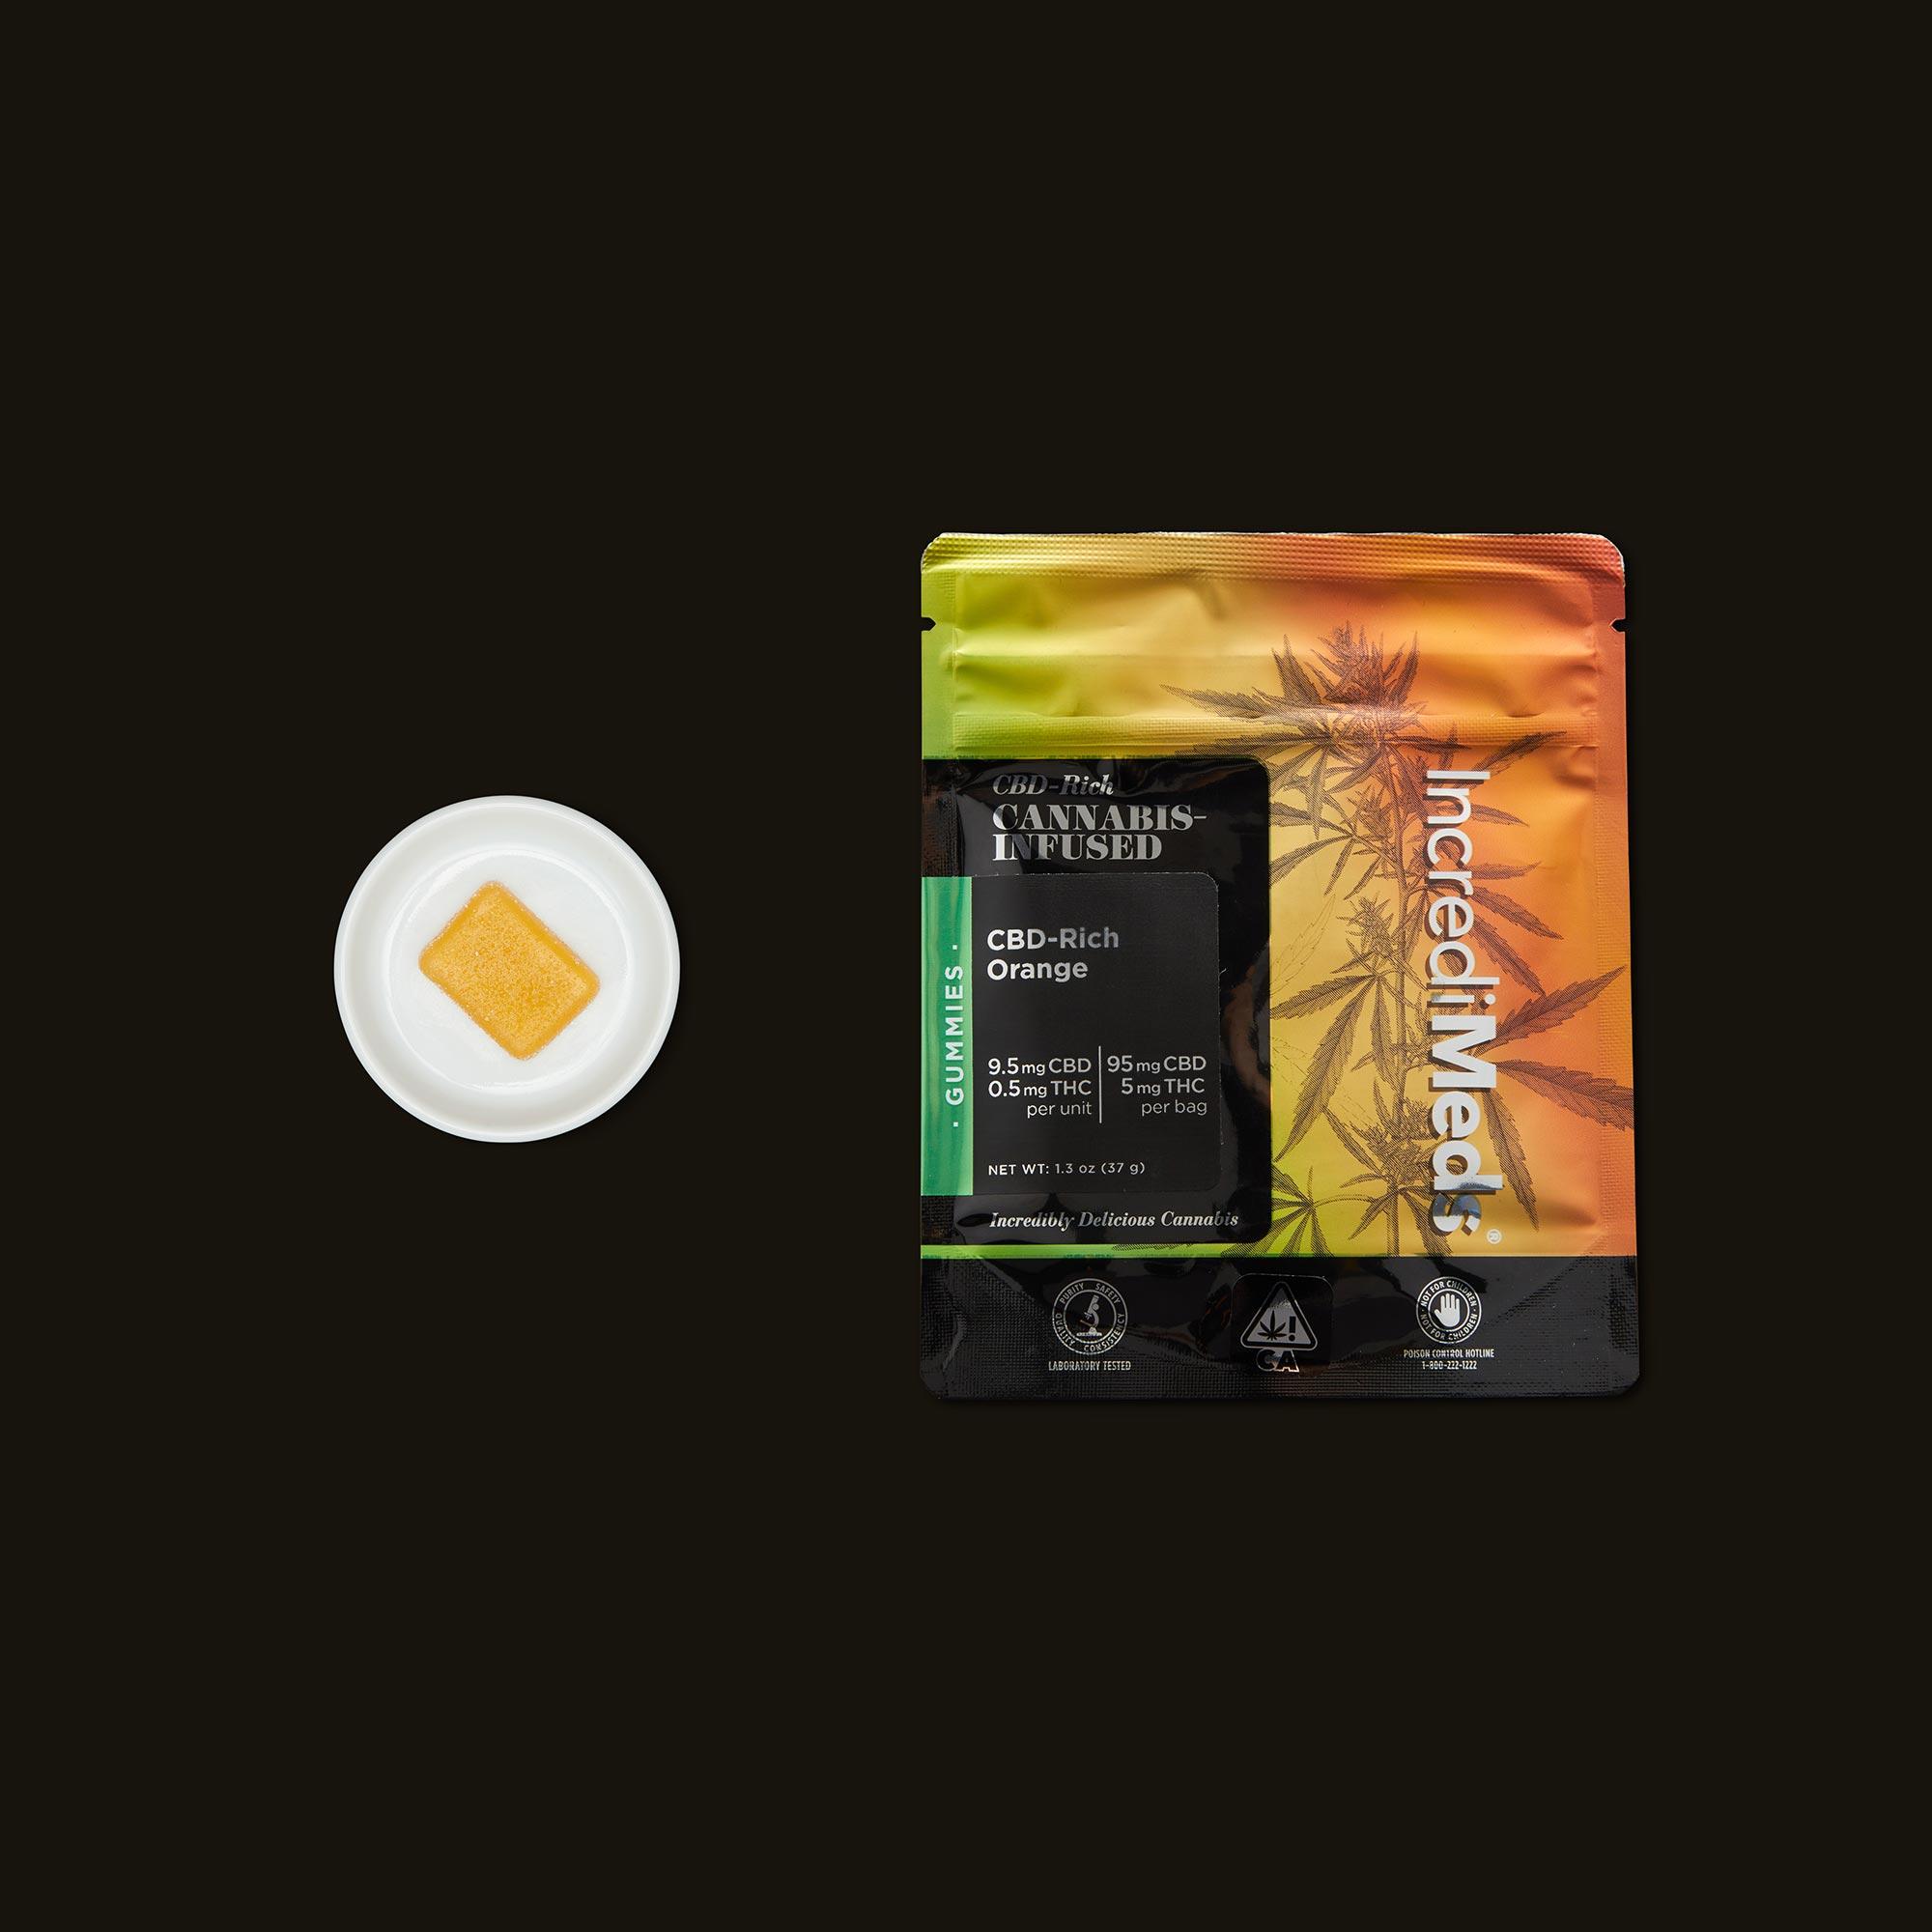 IncrediMeds CBD-Rich Orange Gummies with Packaging